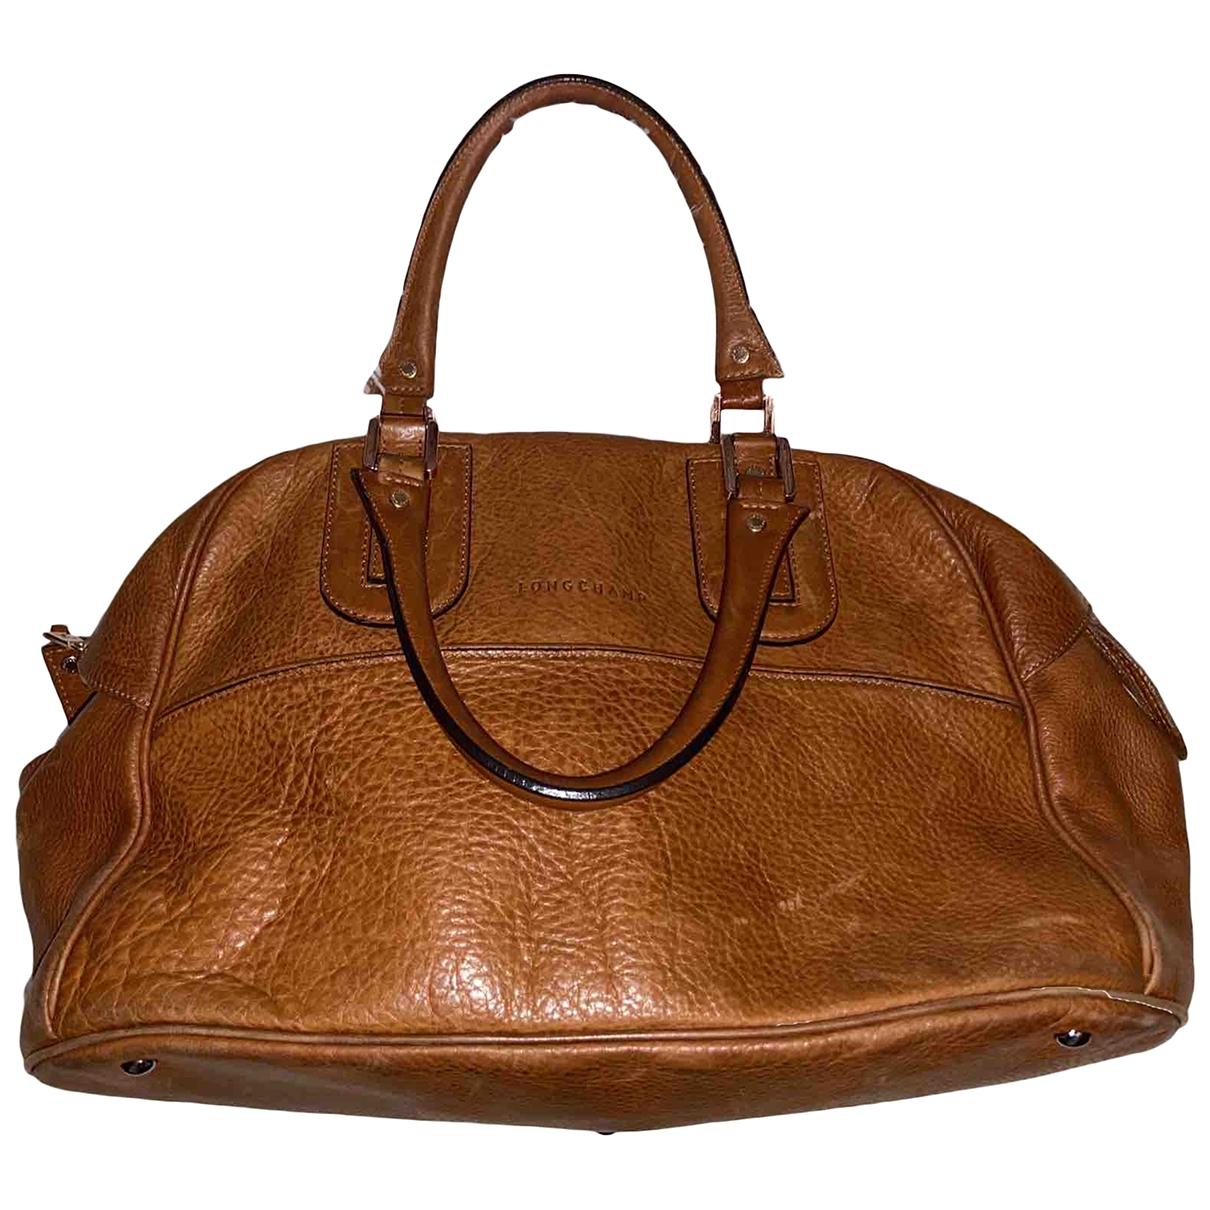 Longchamp - Sac a main Cosmos pour femme en cuir - camel